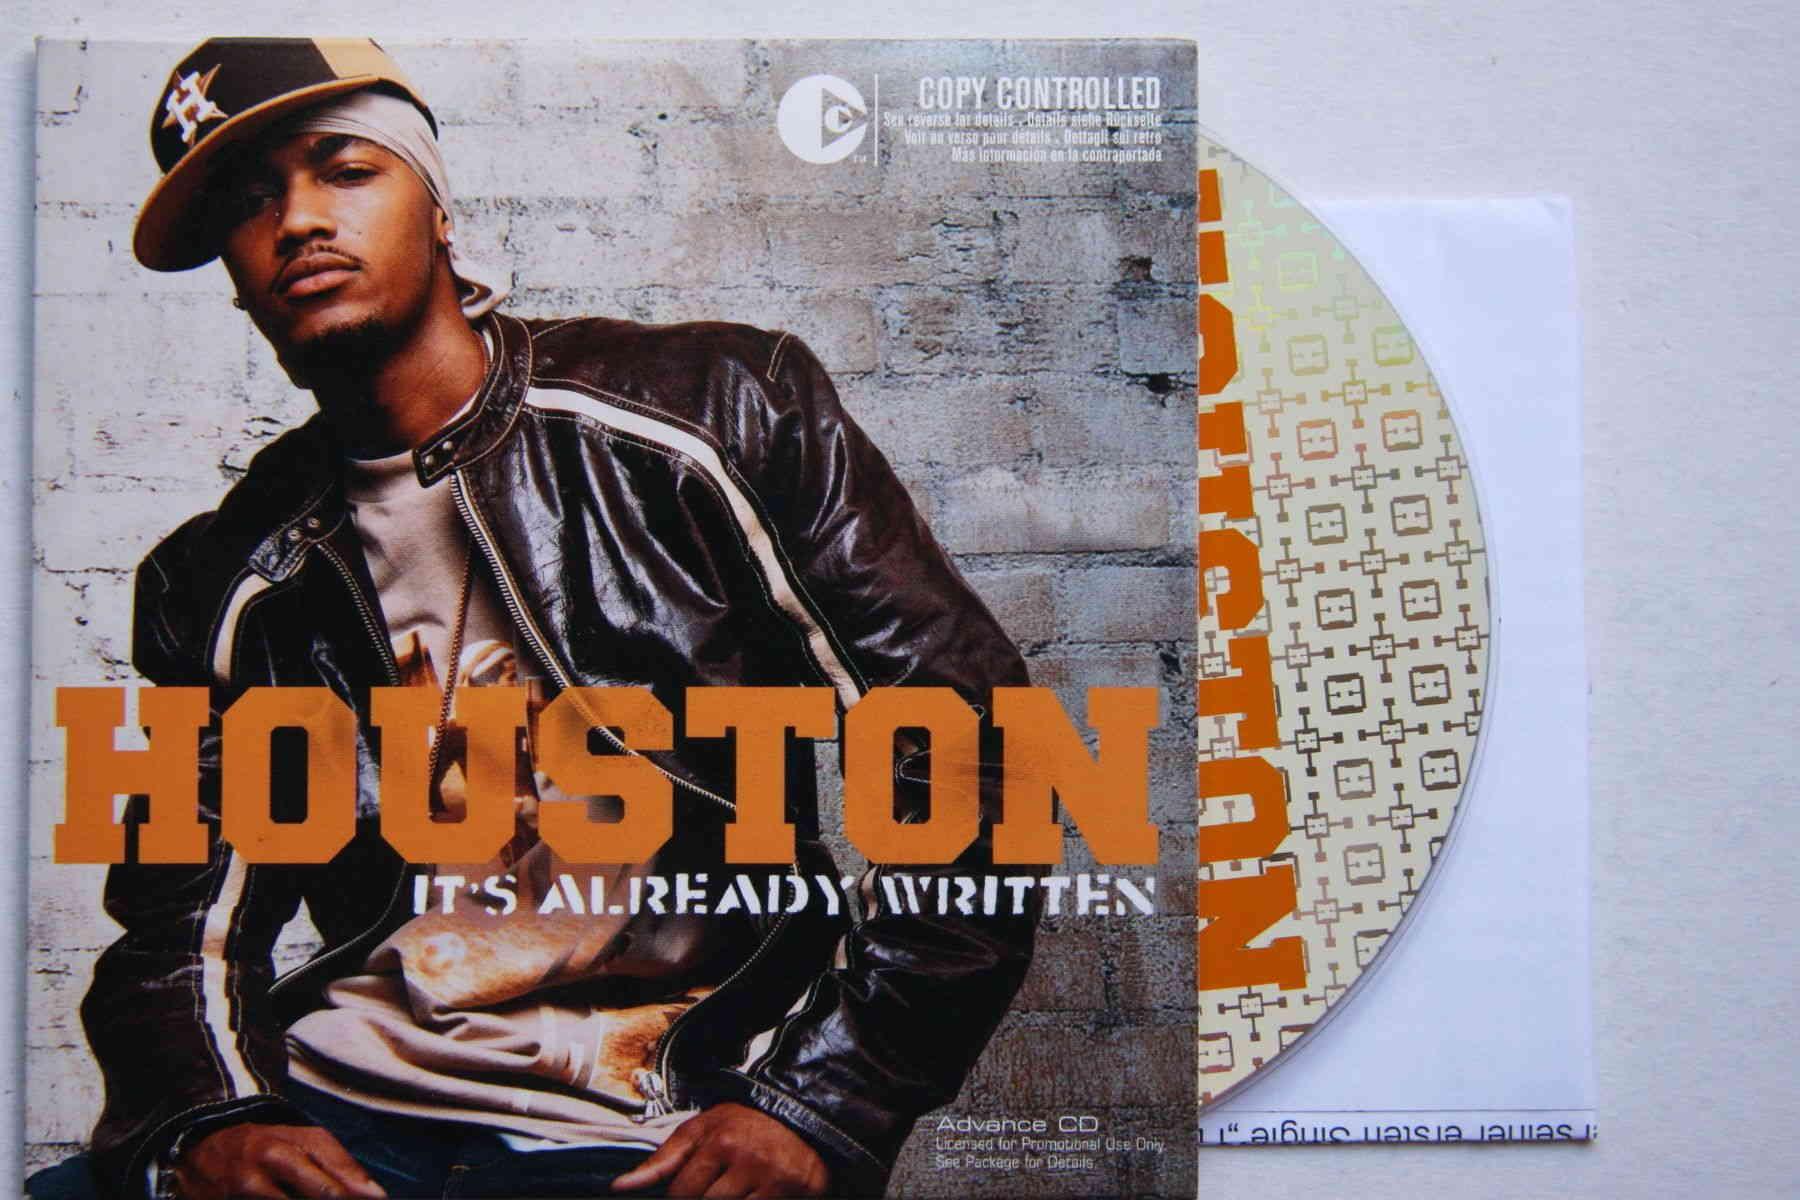 Houston It S Already Written Records Lps Vinyl And Cds